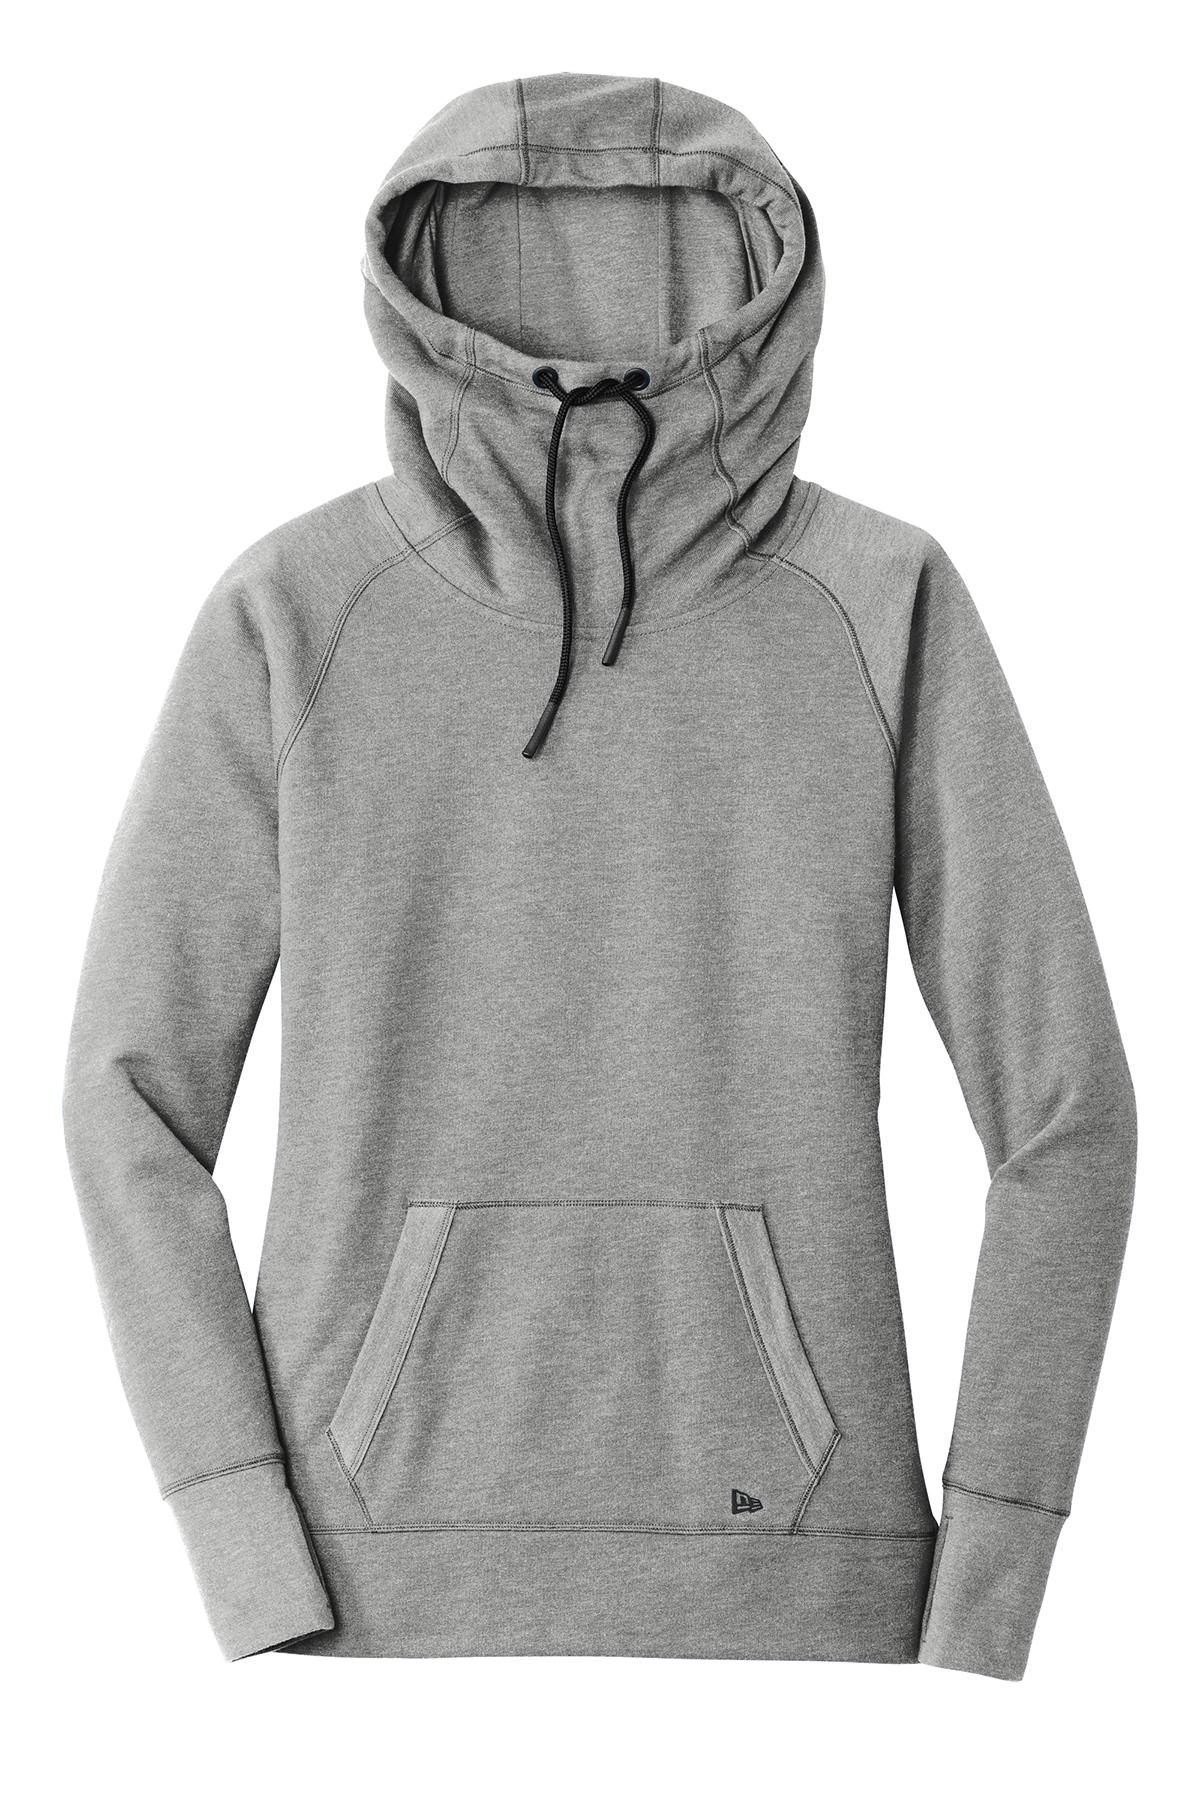 NEW** LNEA510 New Era® Ladies Tri-Blend Fleece Pullover Hoodie